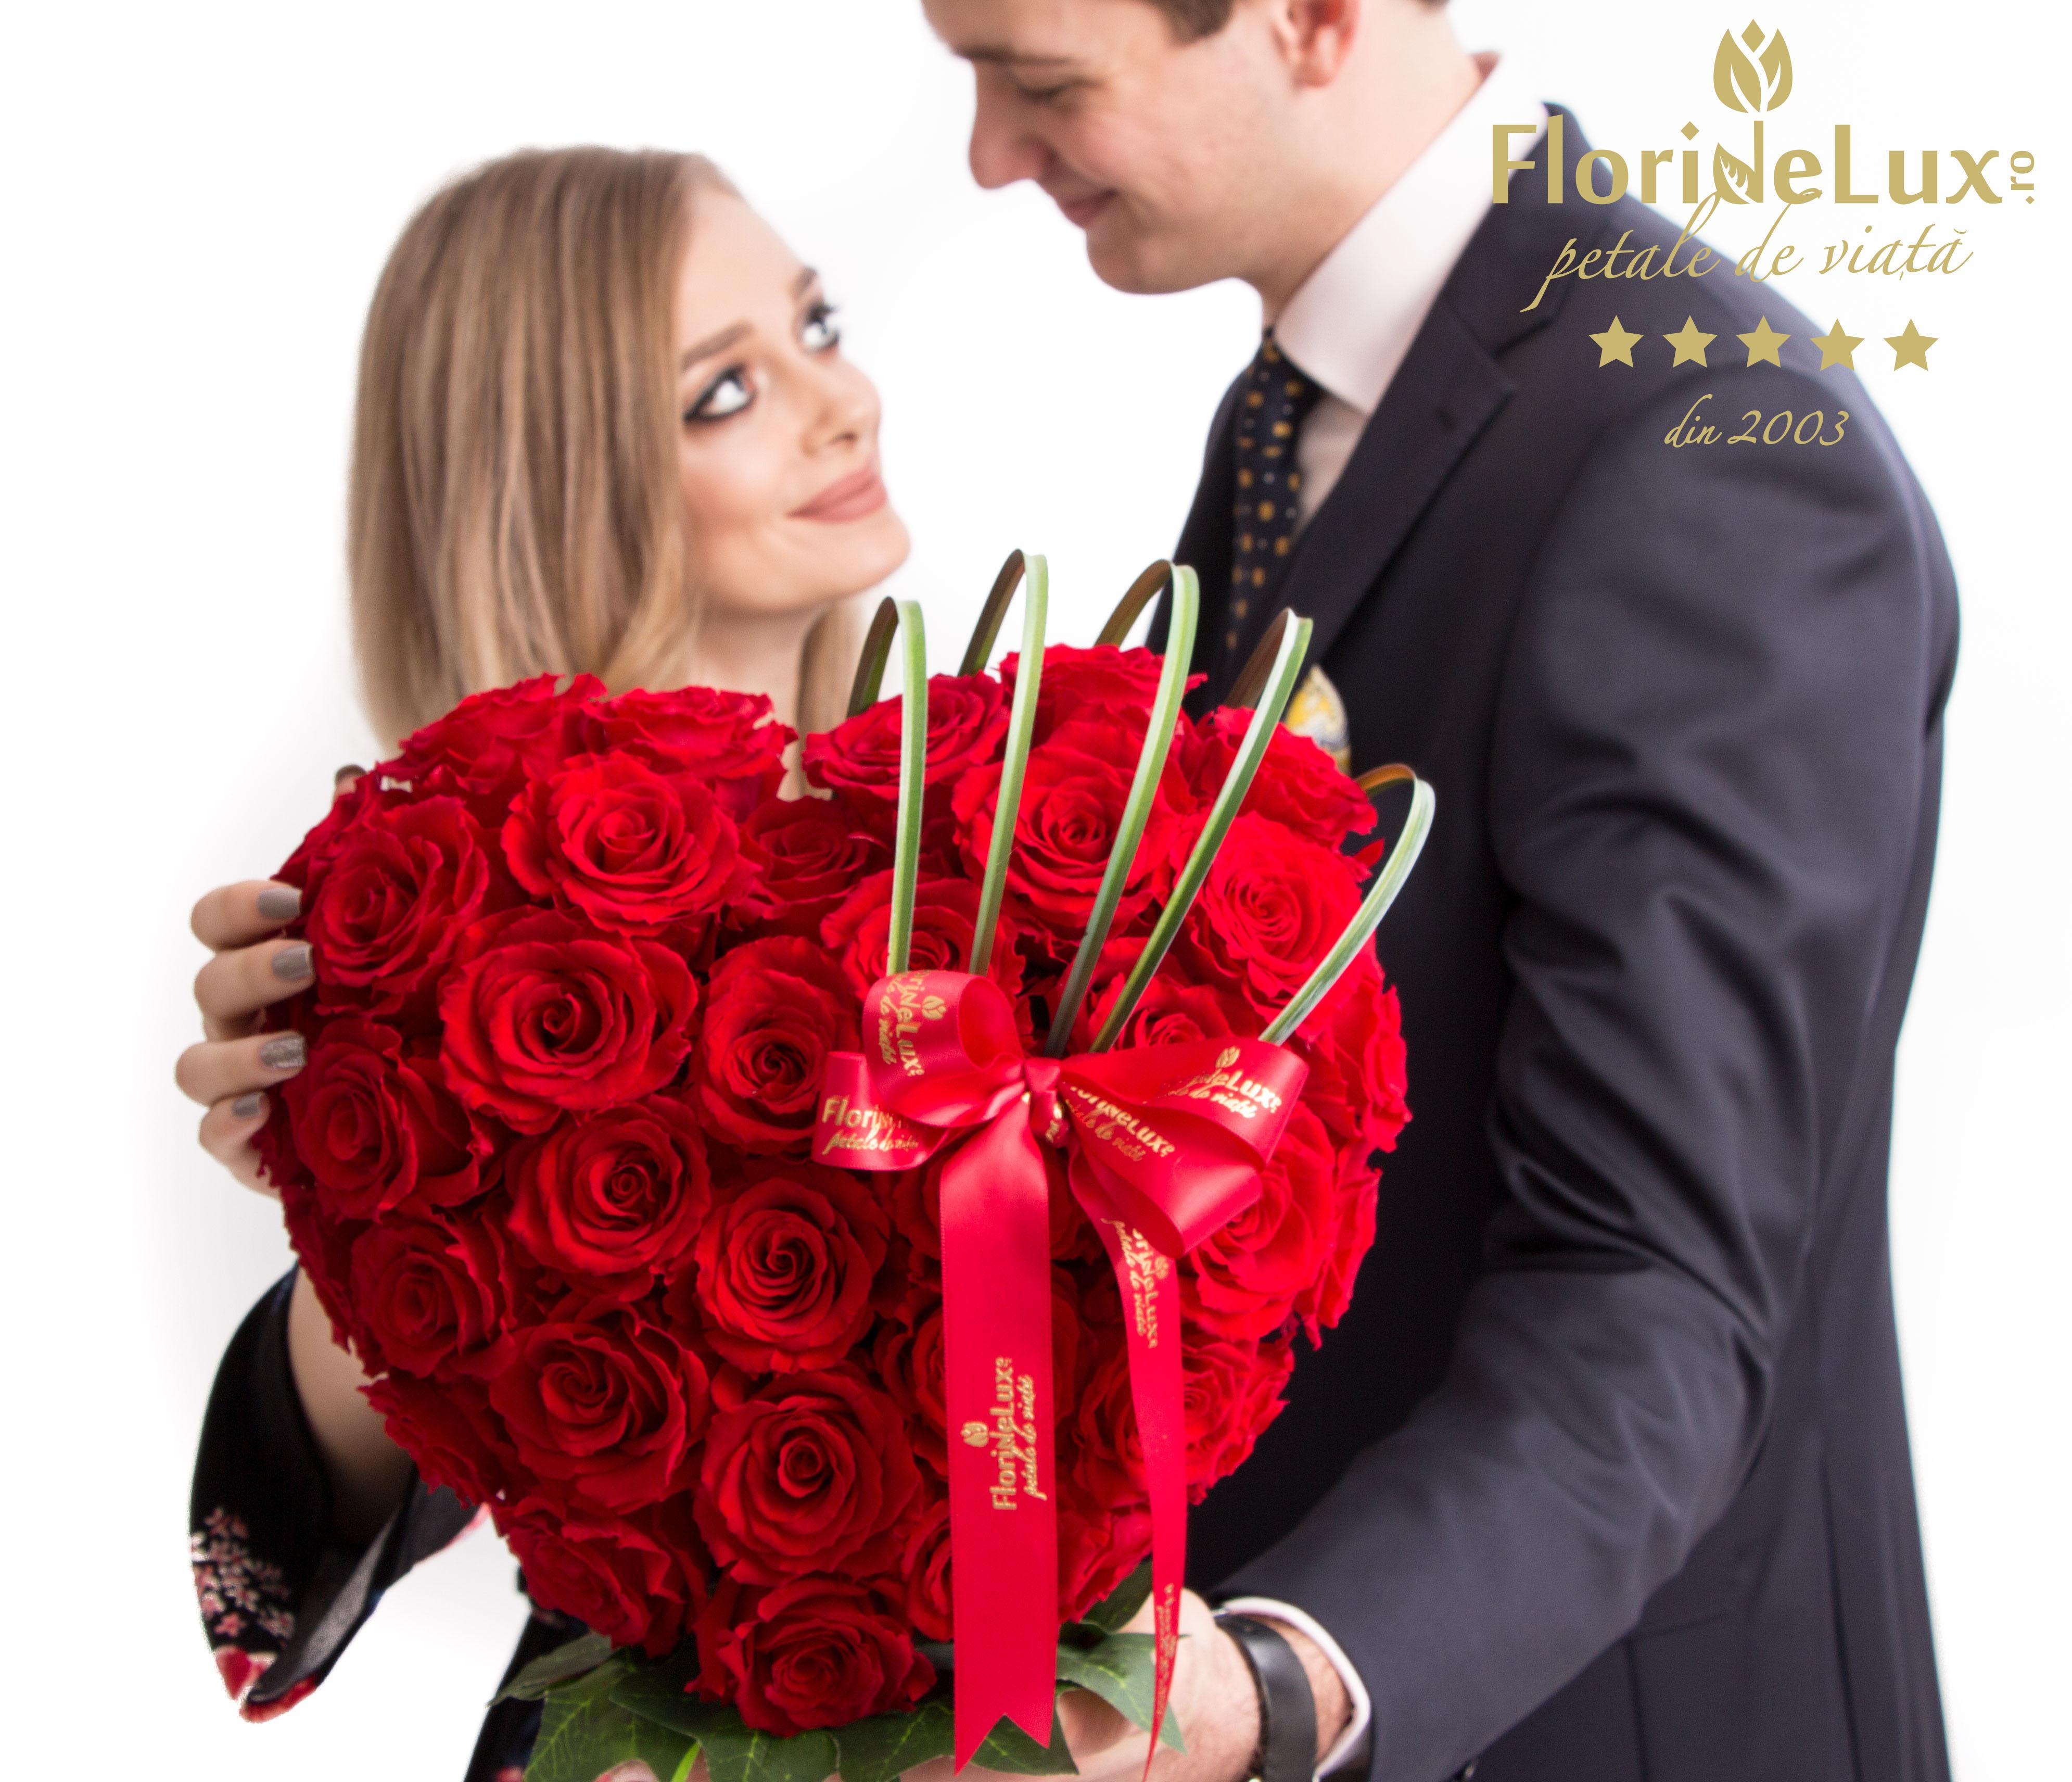 Trandafirii rosii, florile preferate ale romanilor